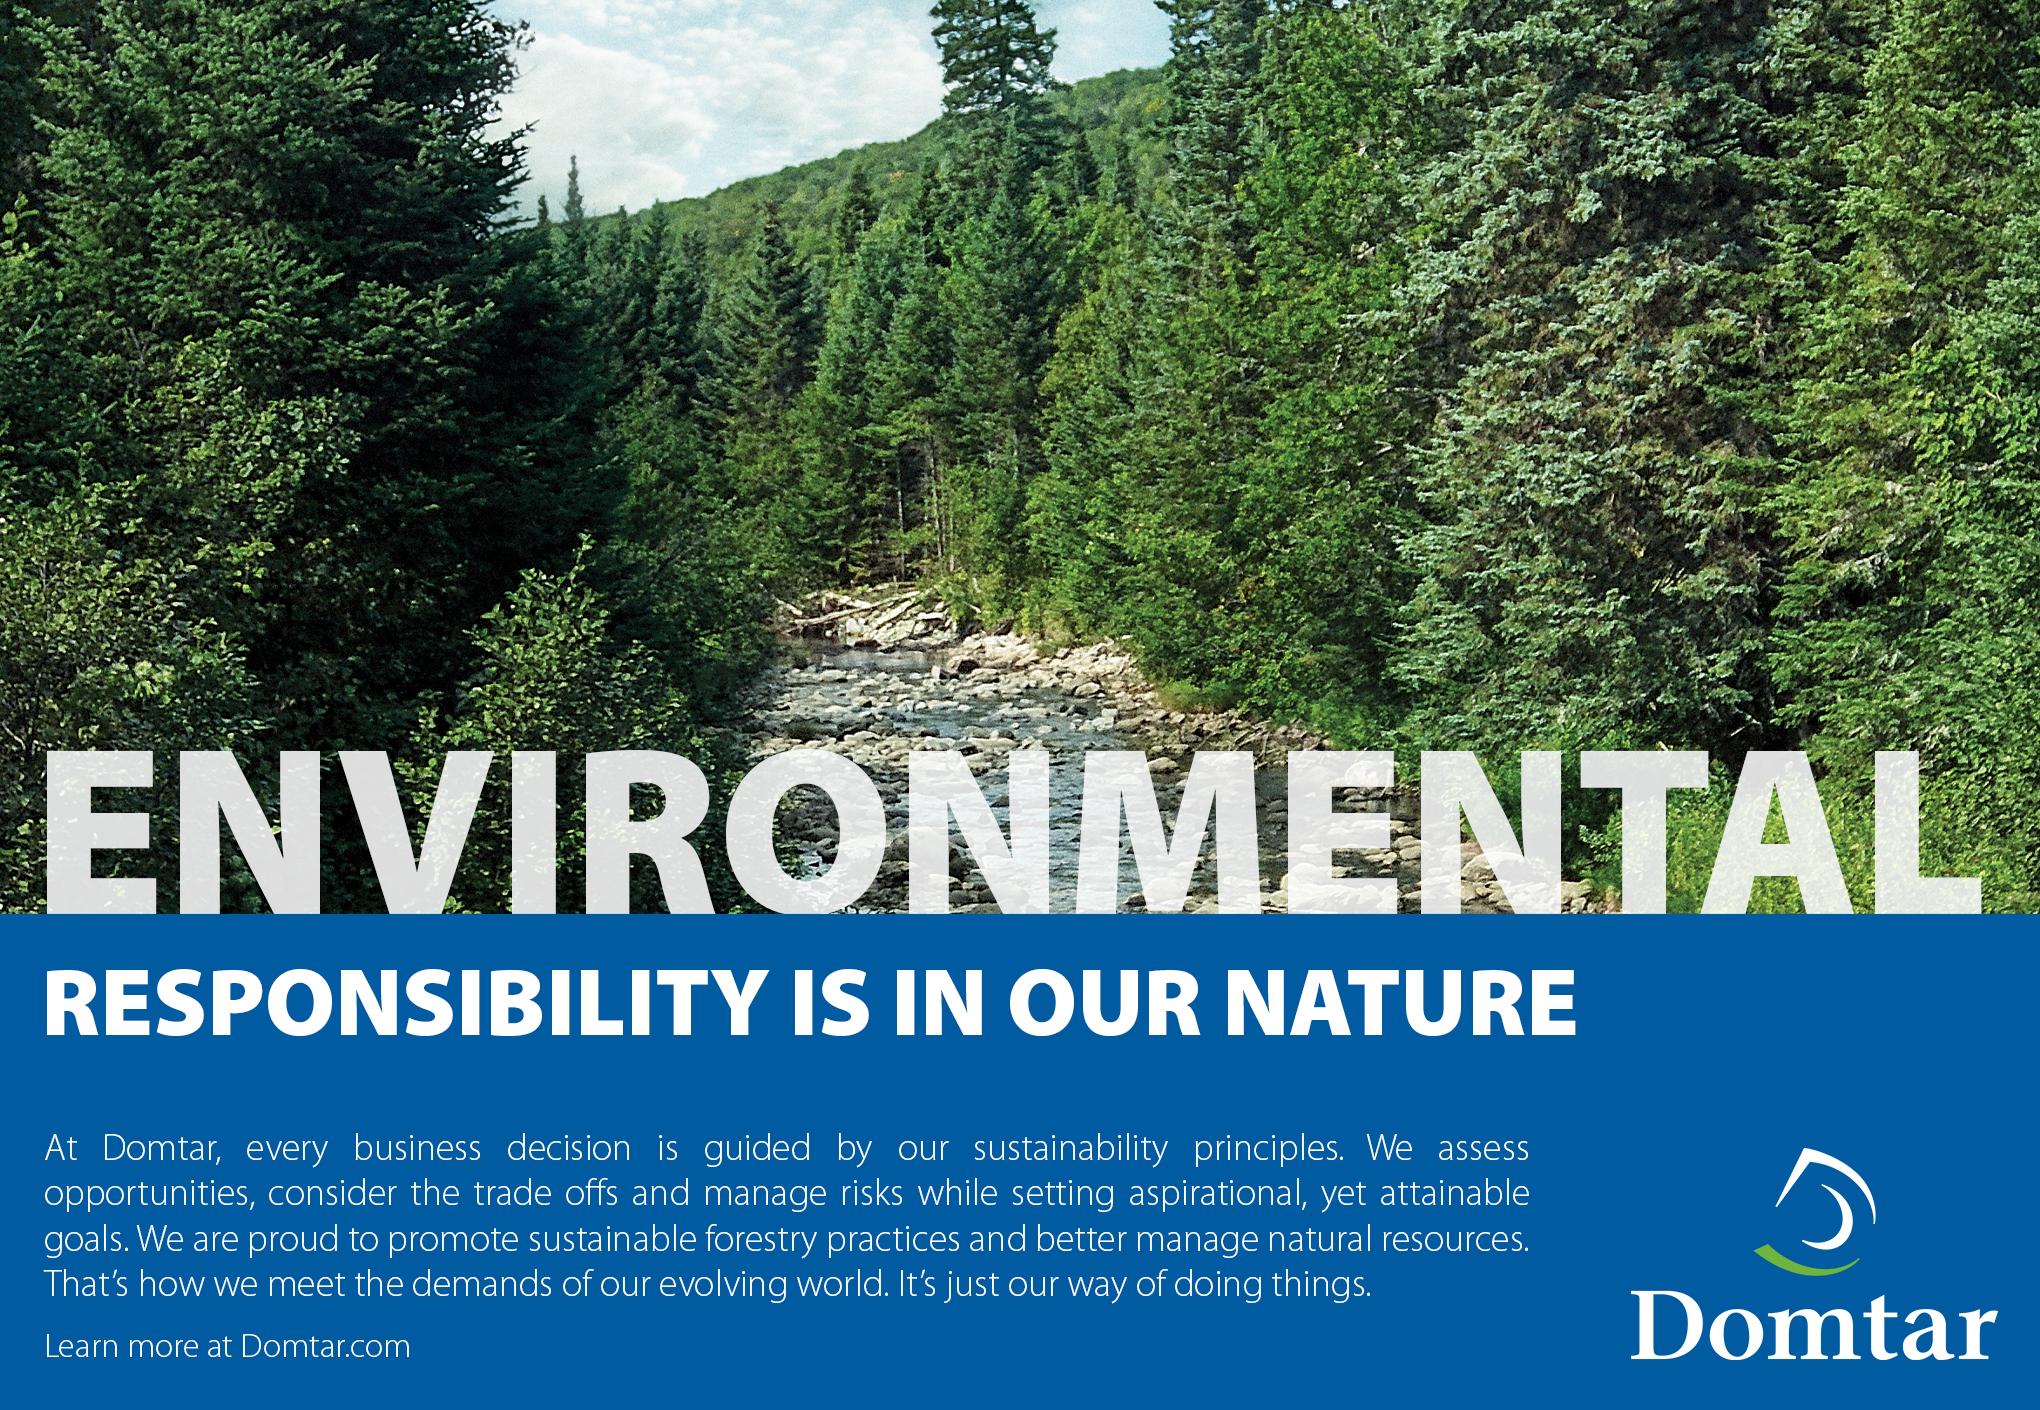 Domtar Environmental Dryden Ad_6.8x4.7